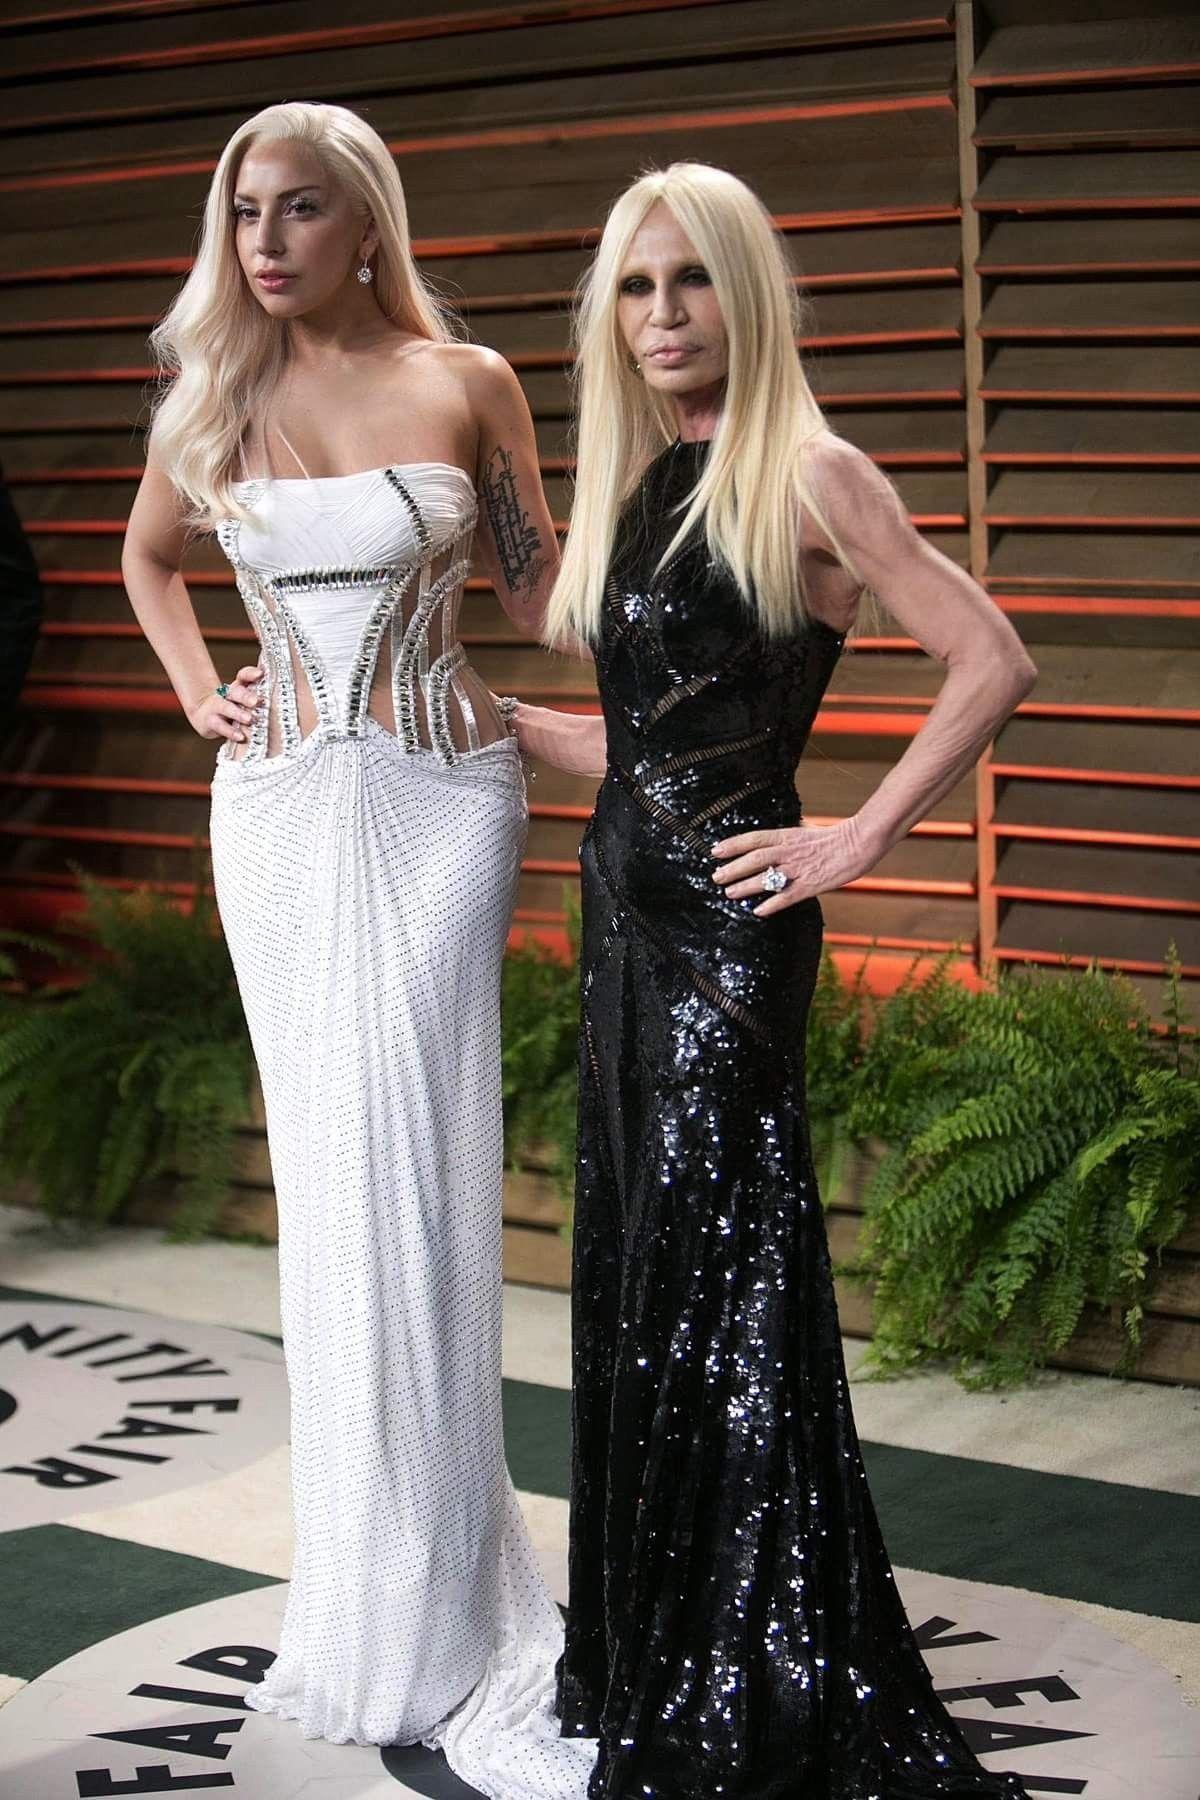 Donatella Versace Lady Gaga Lady Gaga Donatella Lady Gaga Lady